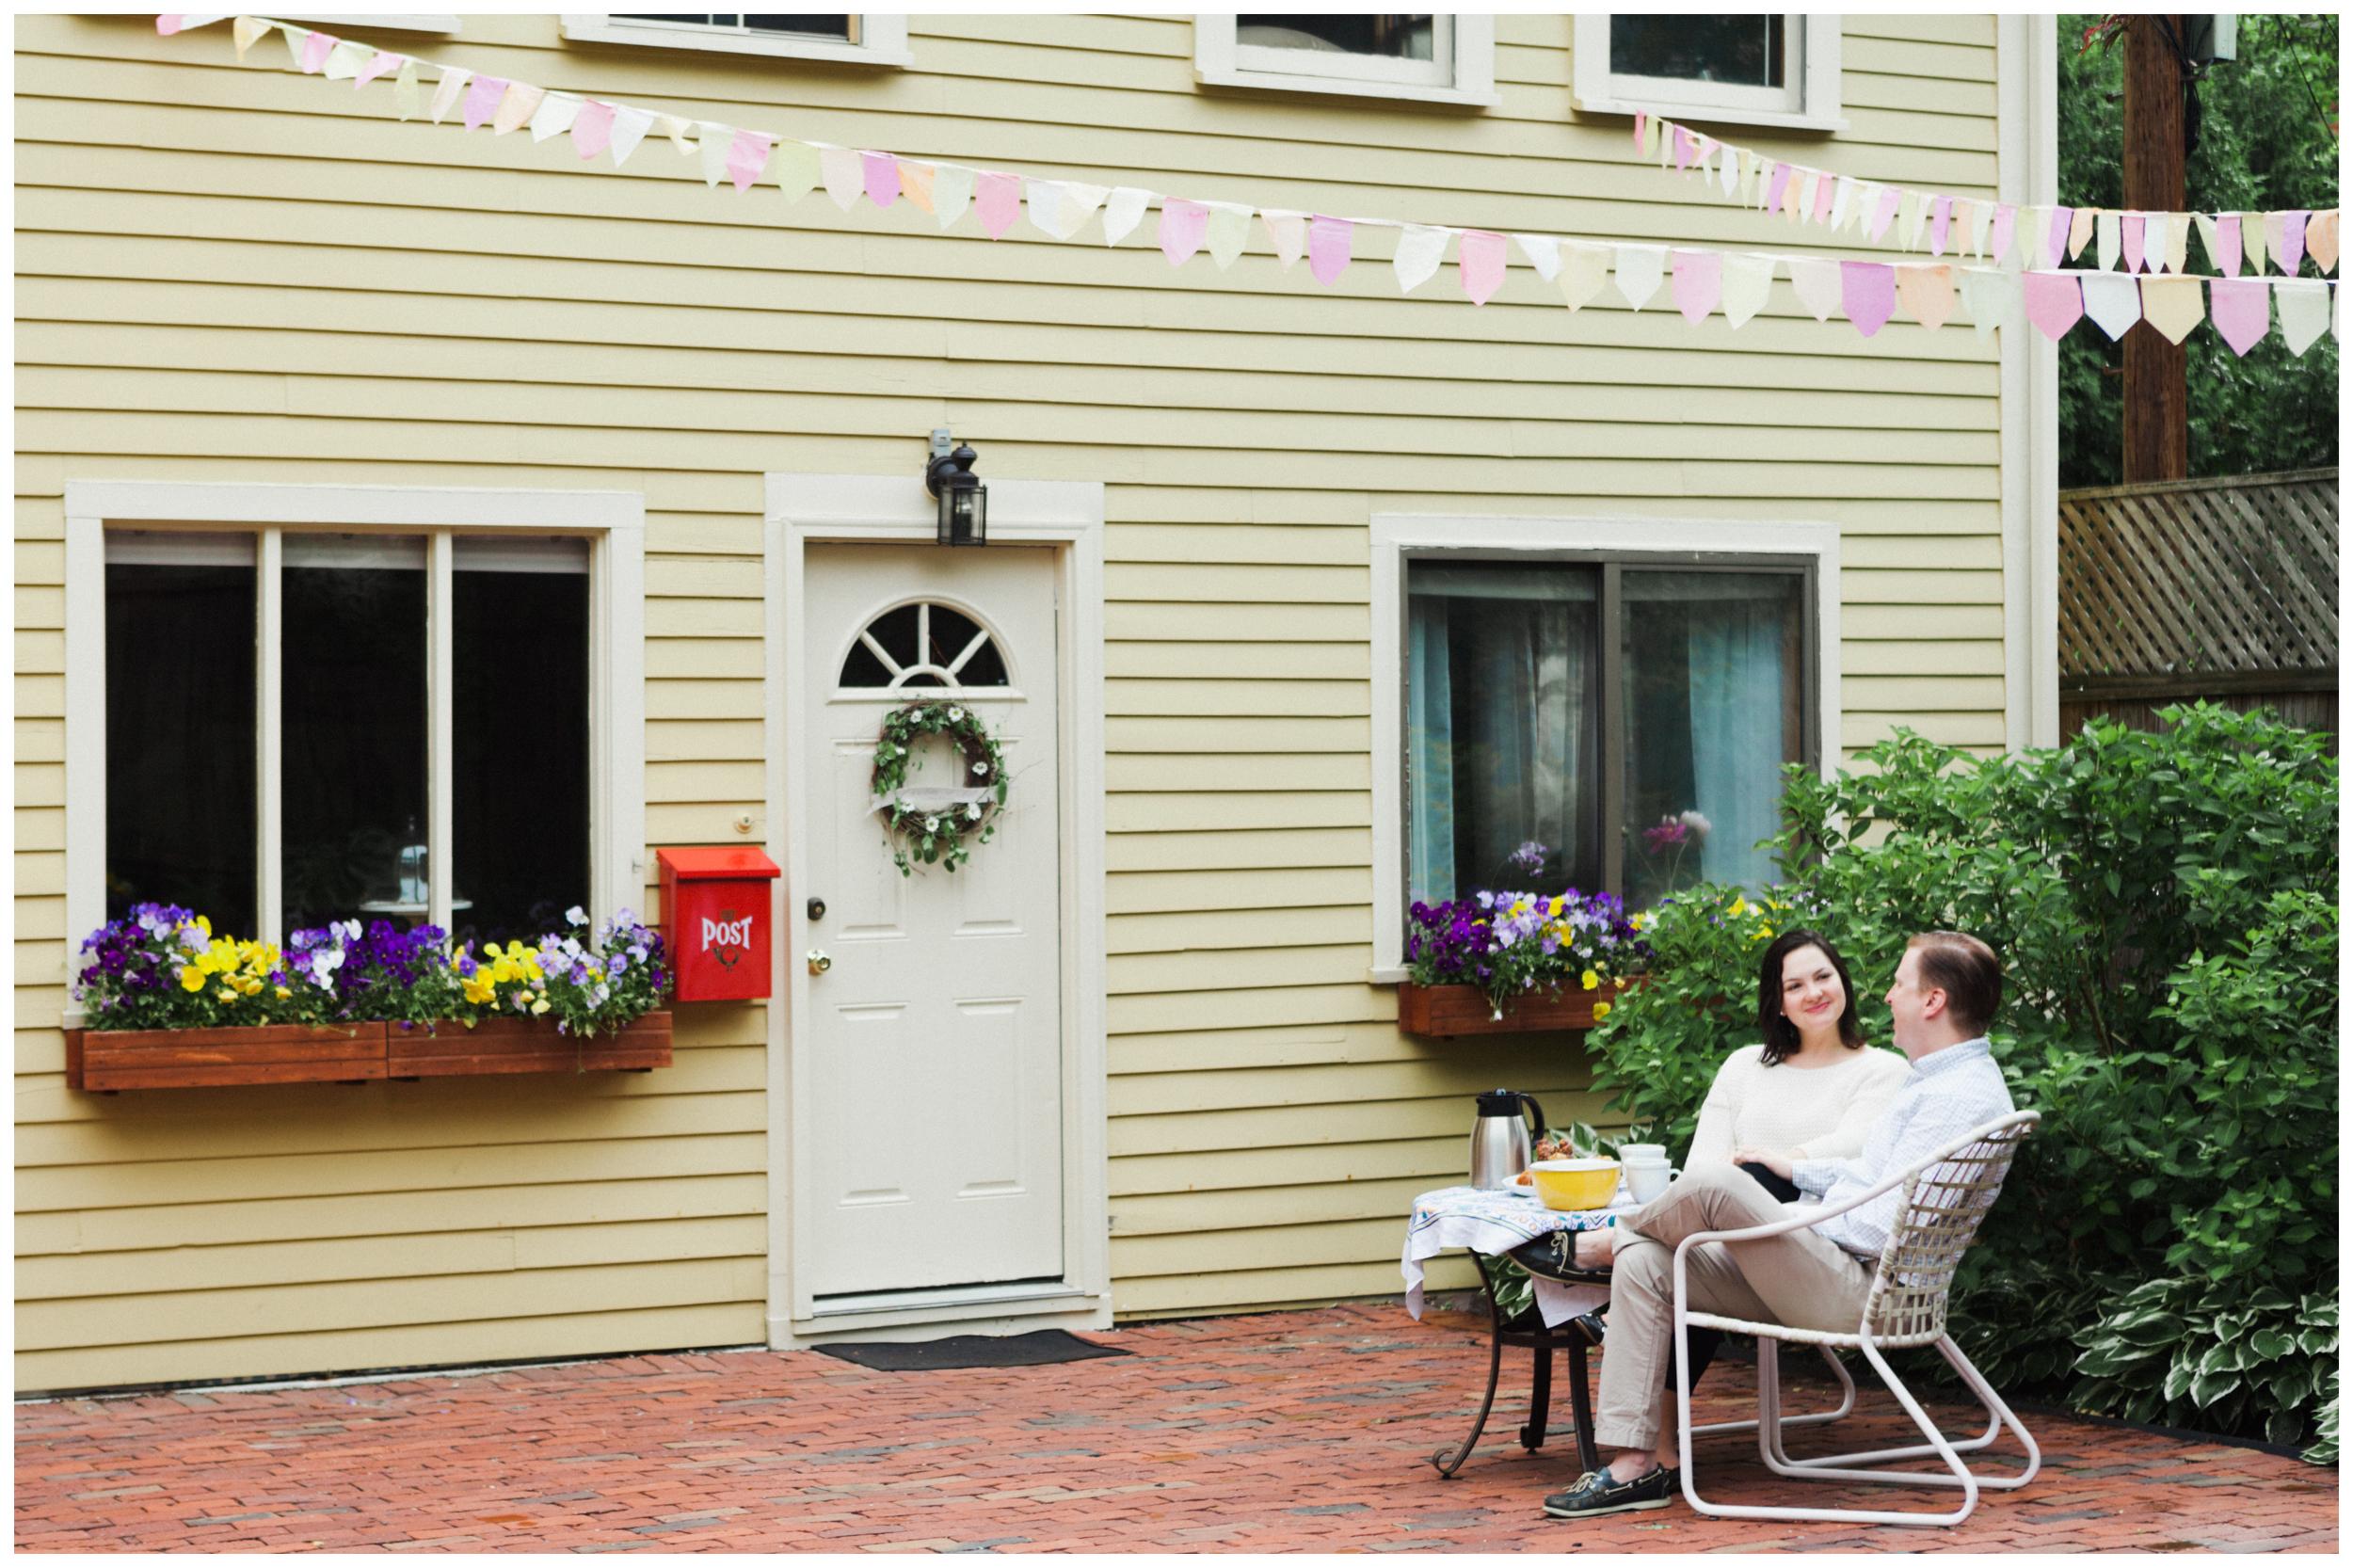 24-Cambridge-At-Home-Engagement-Session-Allison-Sullivan.jpg